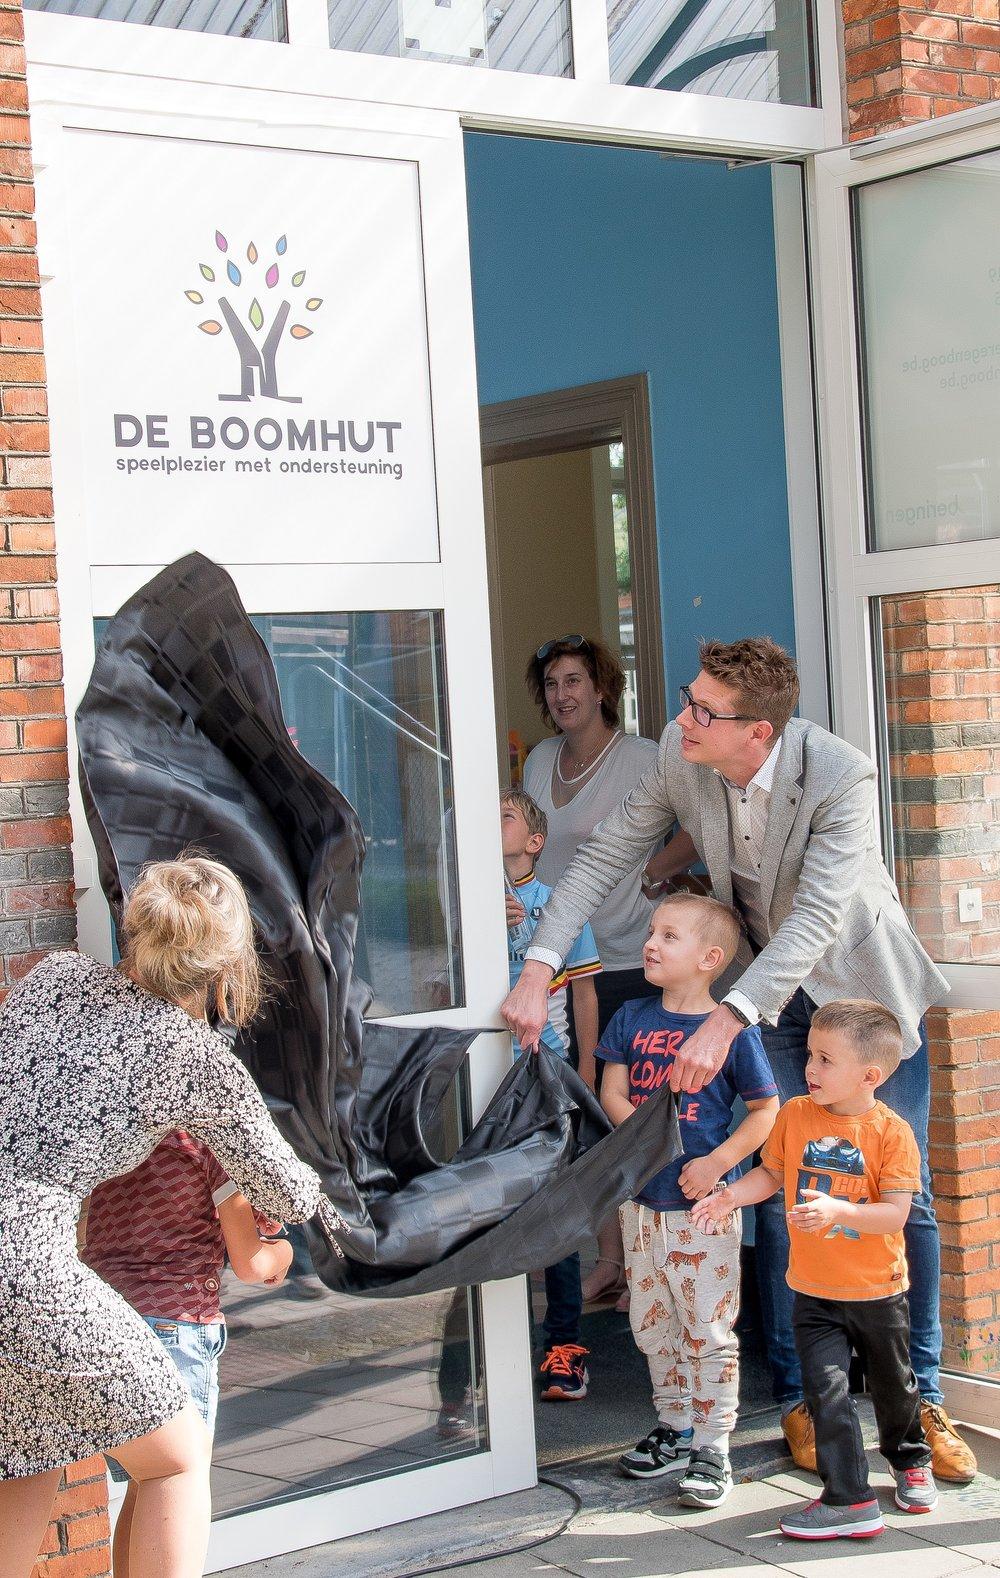 Thomas-Vints-Opening-Boomhut-Beringen